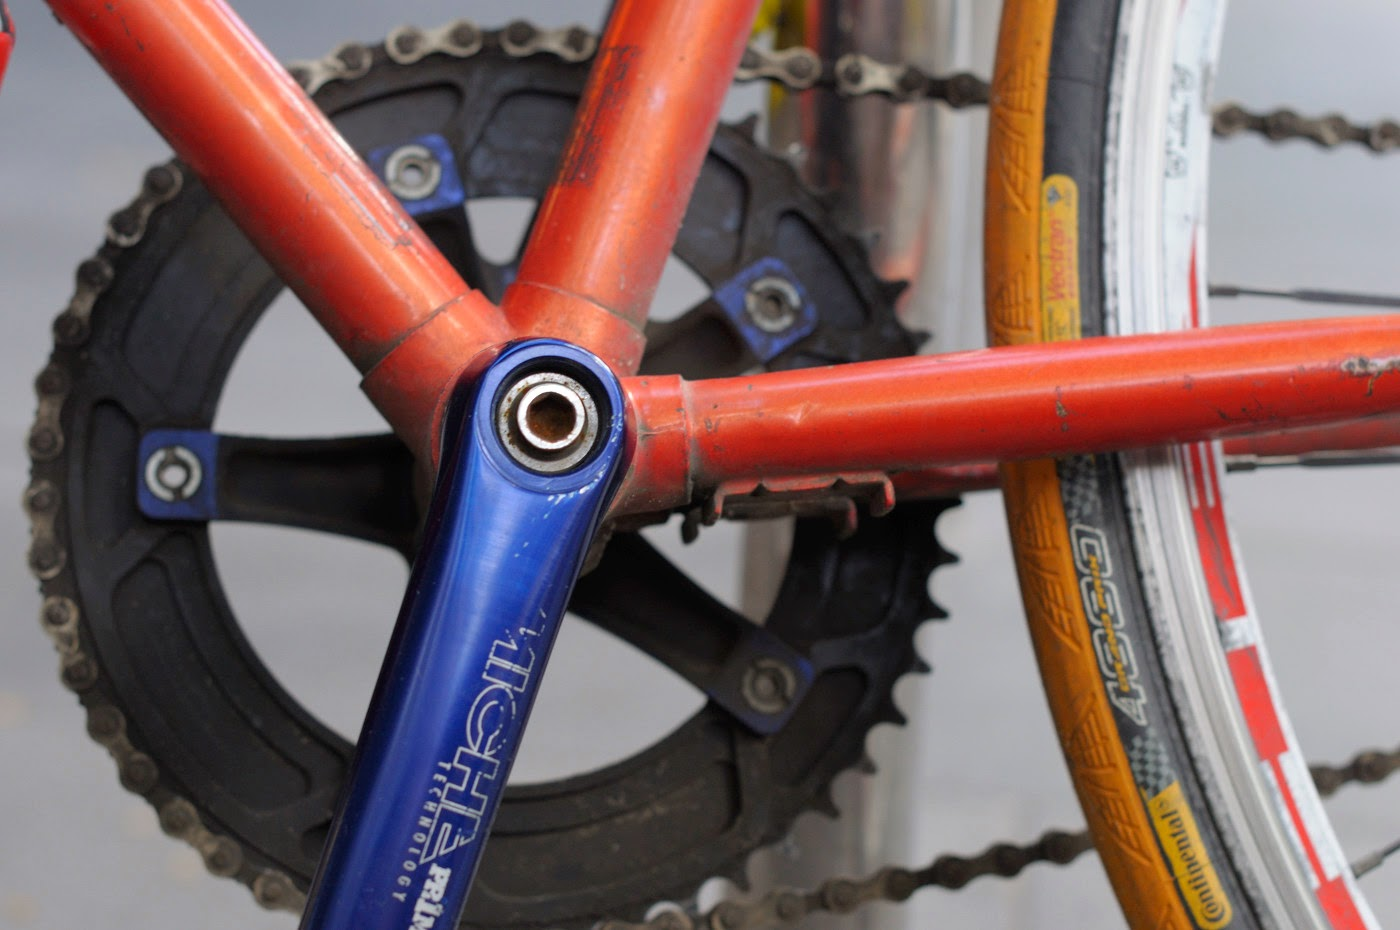 bespoke, custom, single speed, conversion, road bike, swanston st, Melbourne, Australia, decals, stickers, red, selle, miche, crank